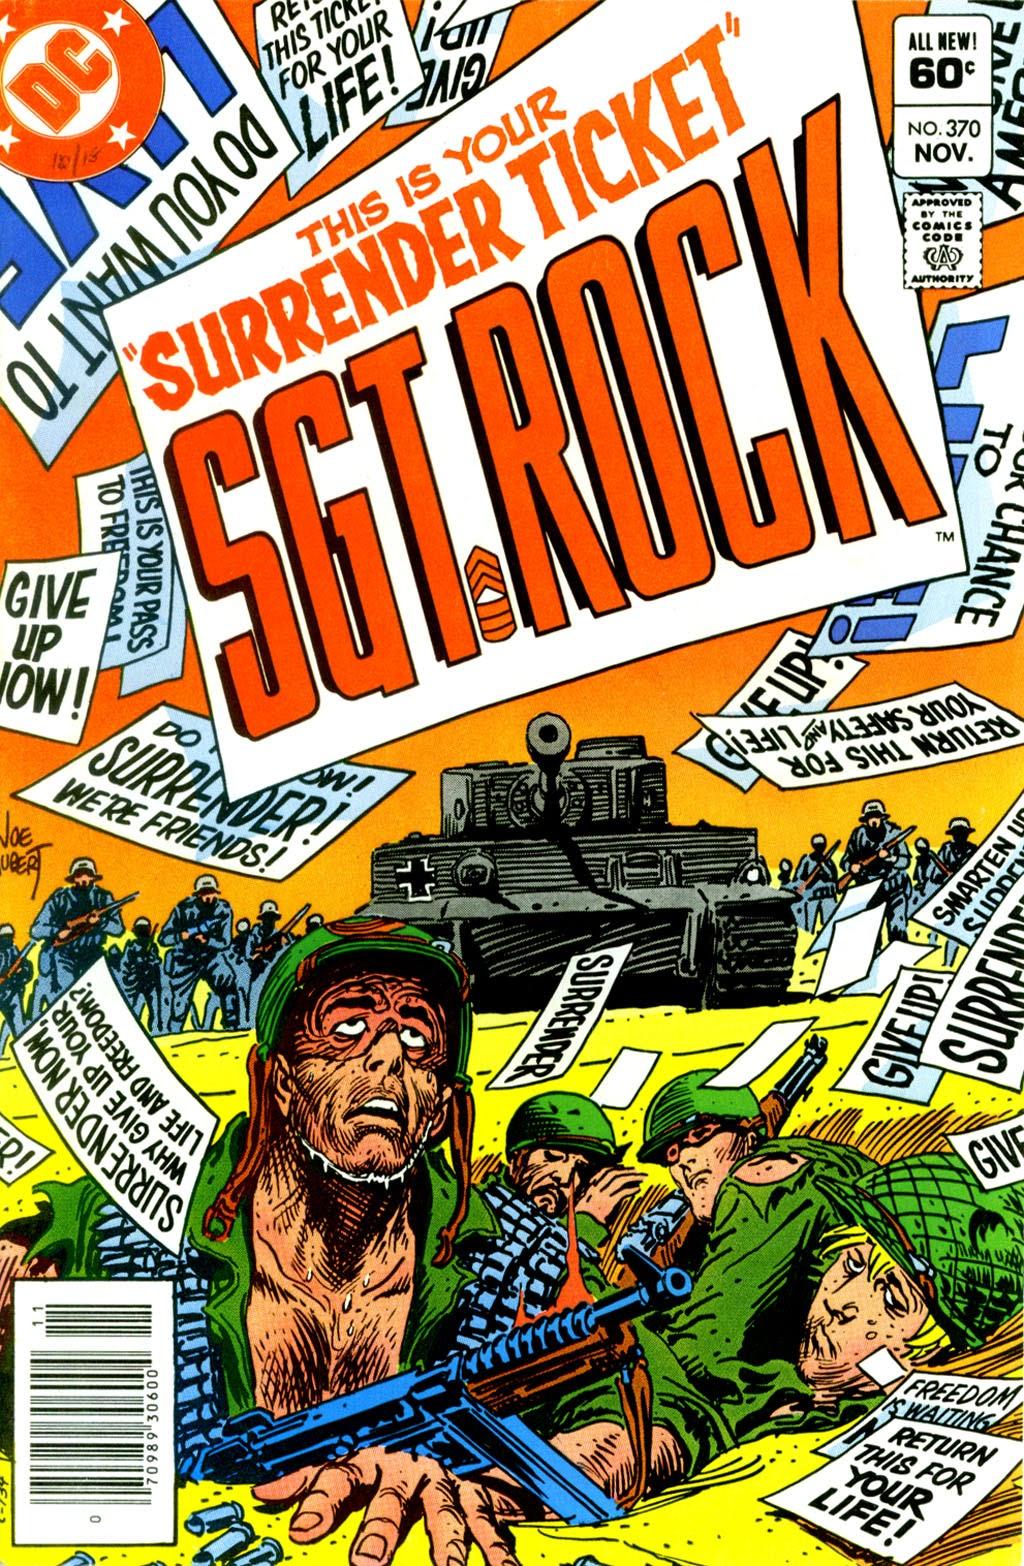 Read online Sgt. Rock comic -  Issue #370 - 1